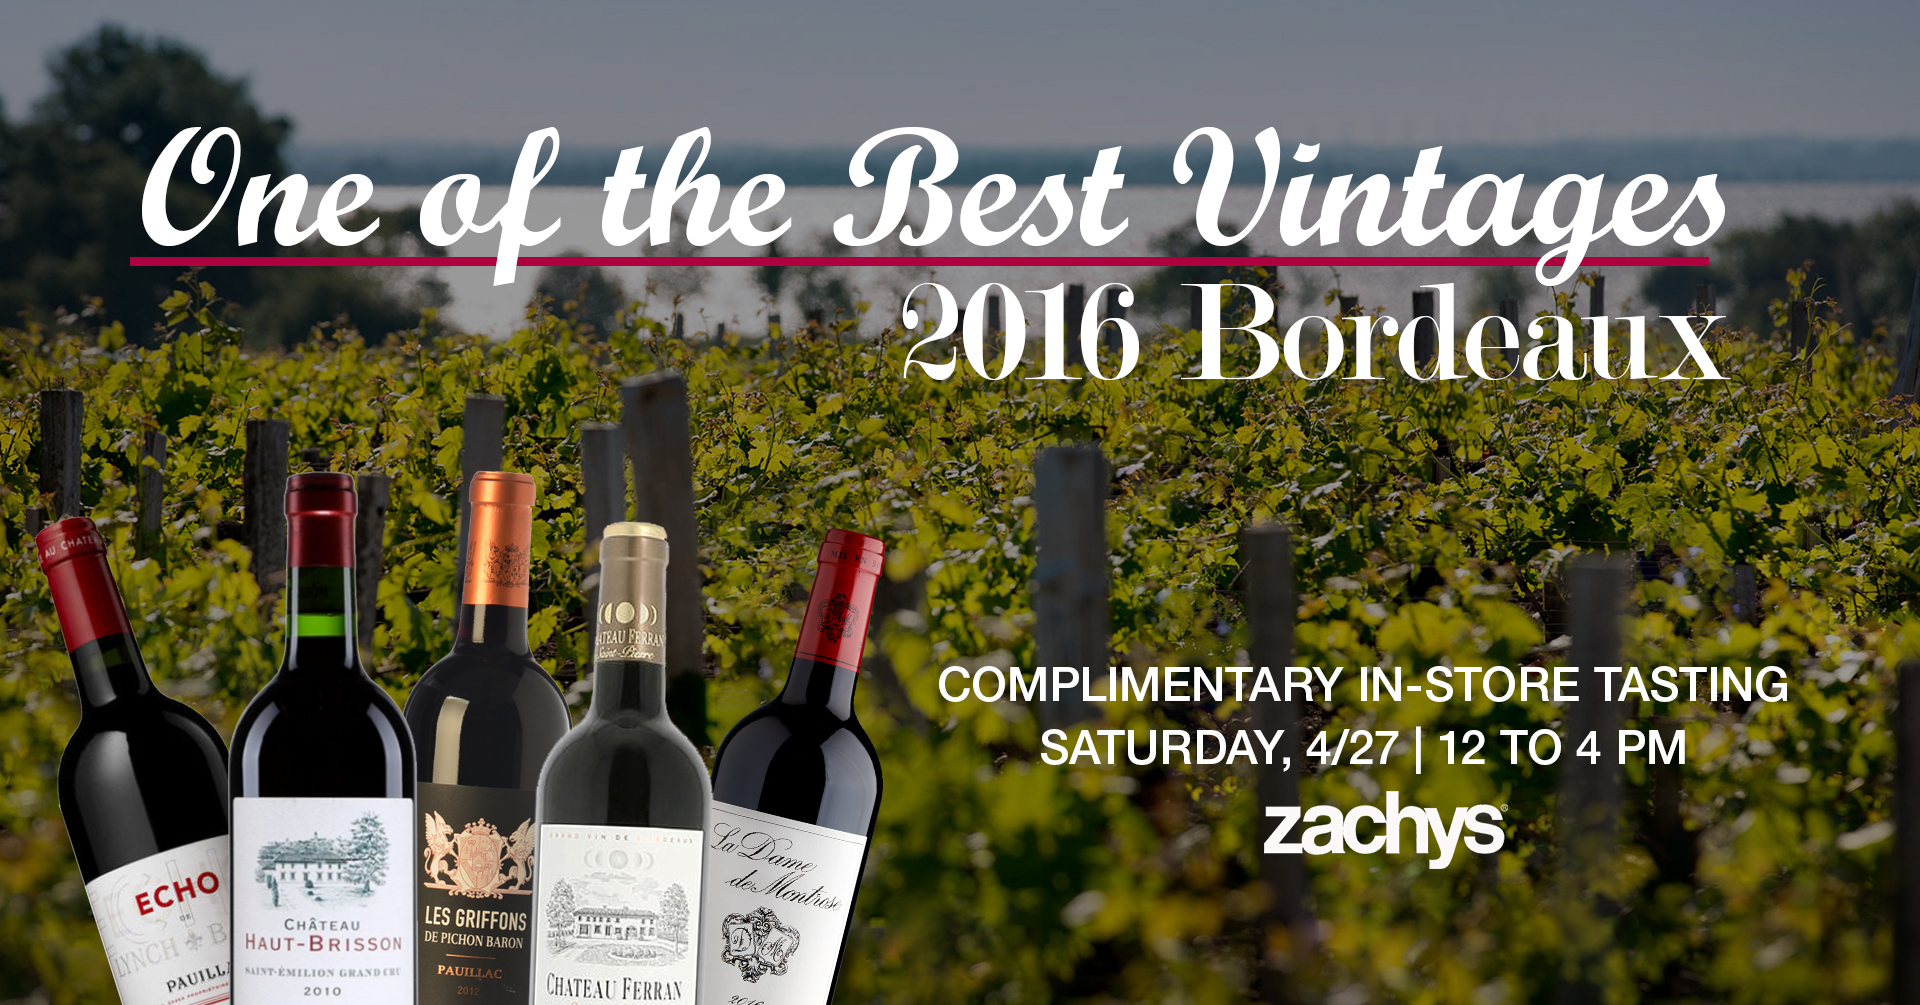 2016 bordeaux tasting event banner, on vineyard background